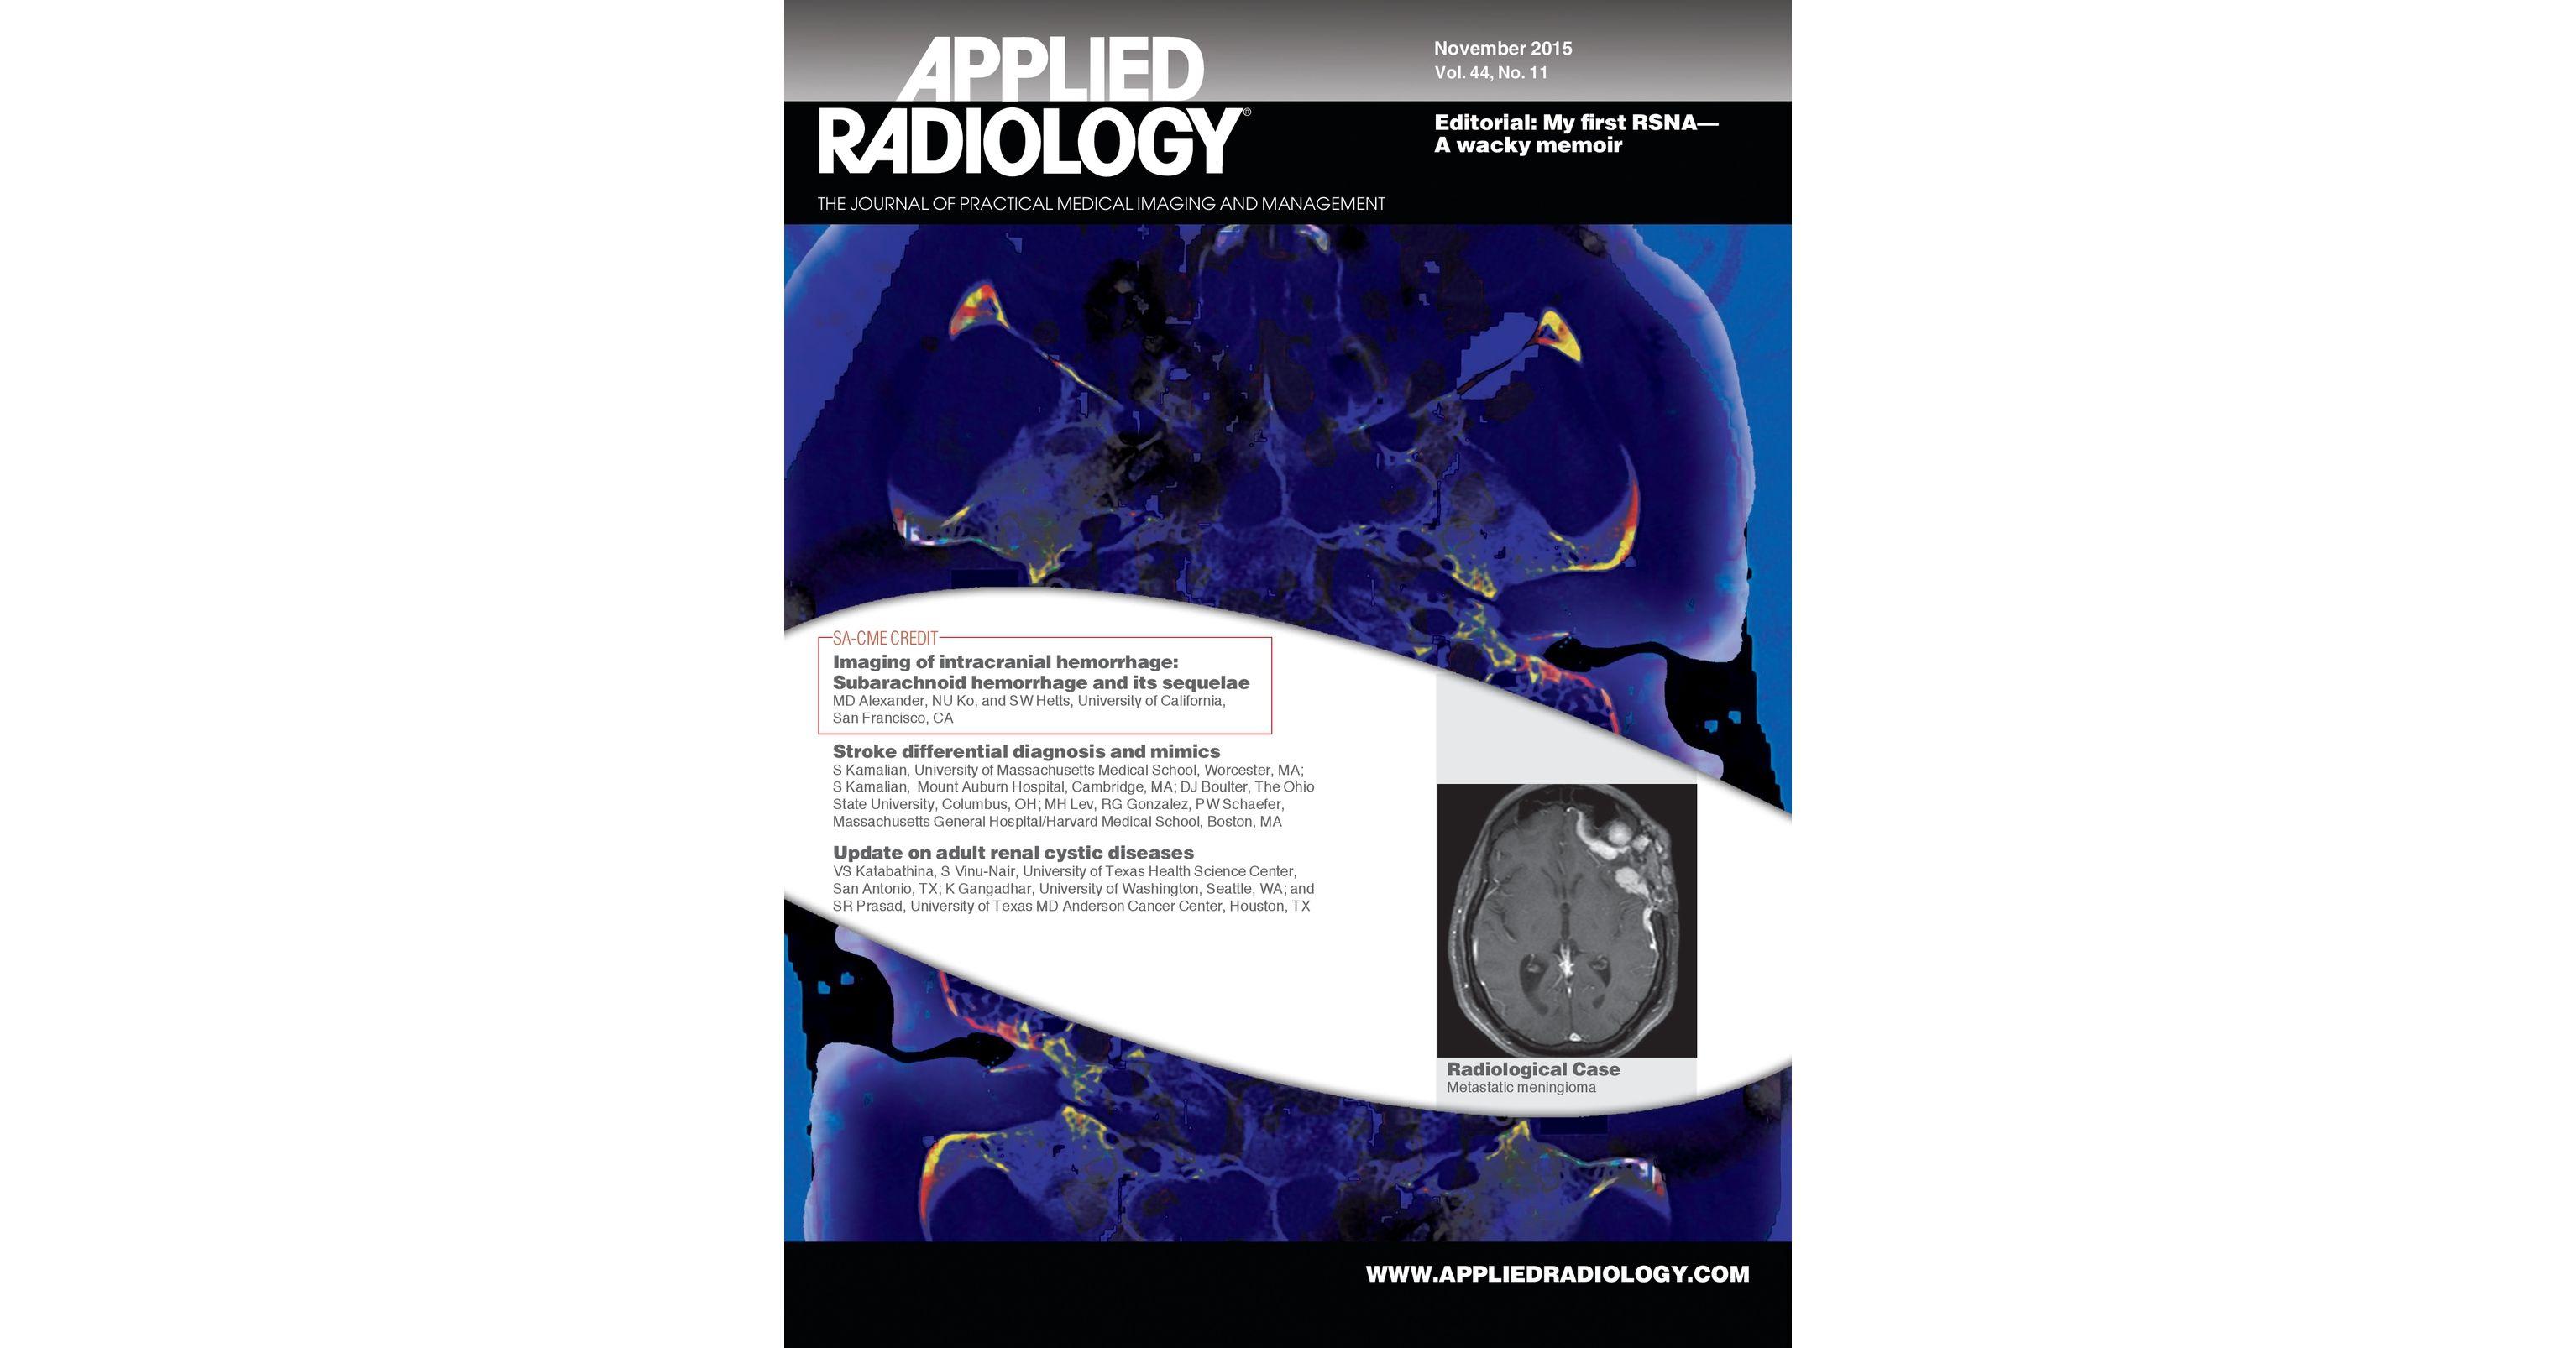 November 2015 Applied Radiology